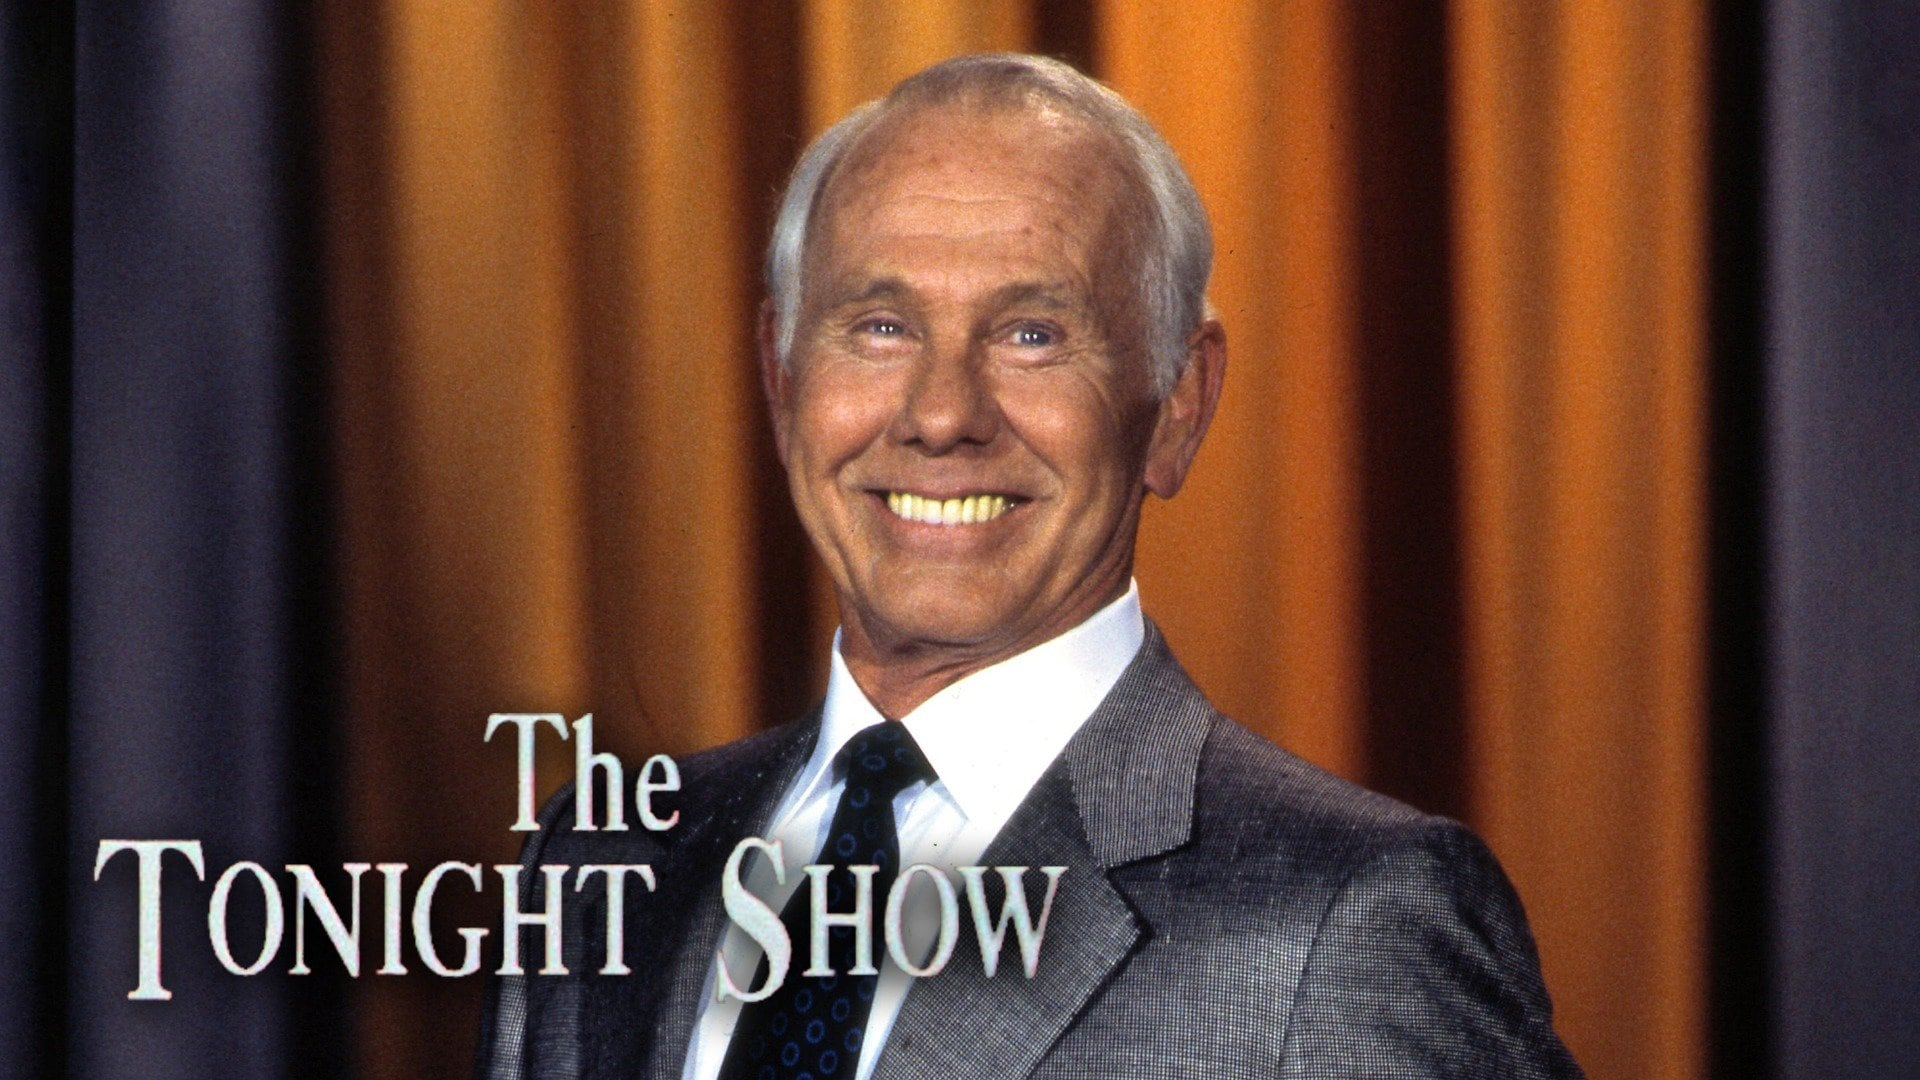 The Johnny Carson Show: Animal Antics With Jim Fowler (6/18/81)